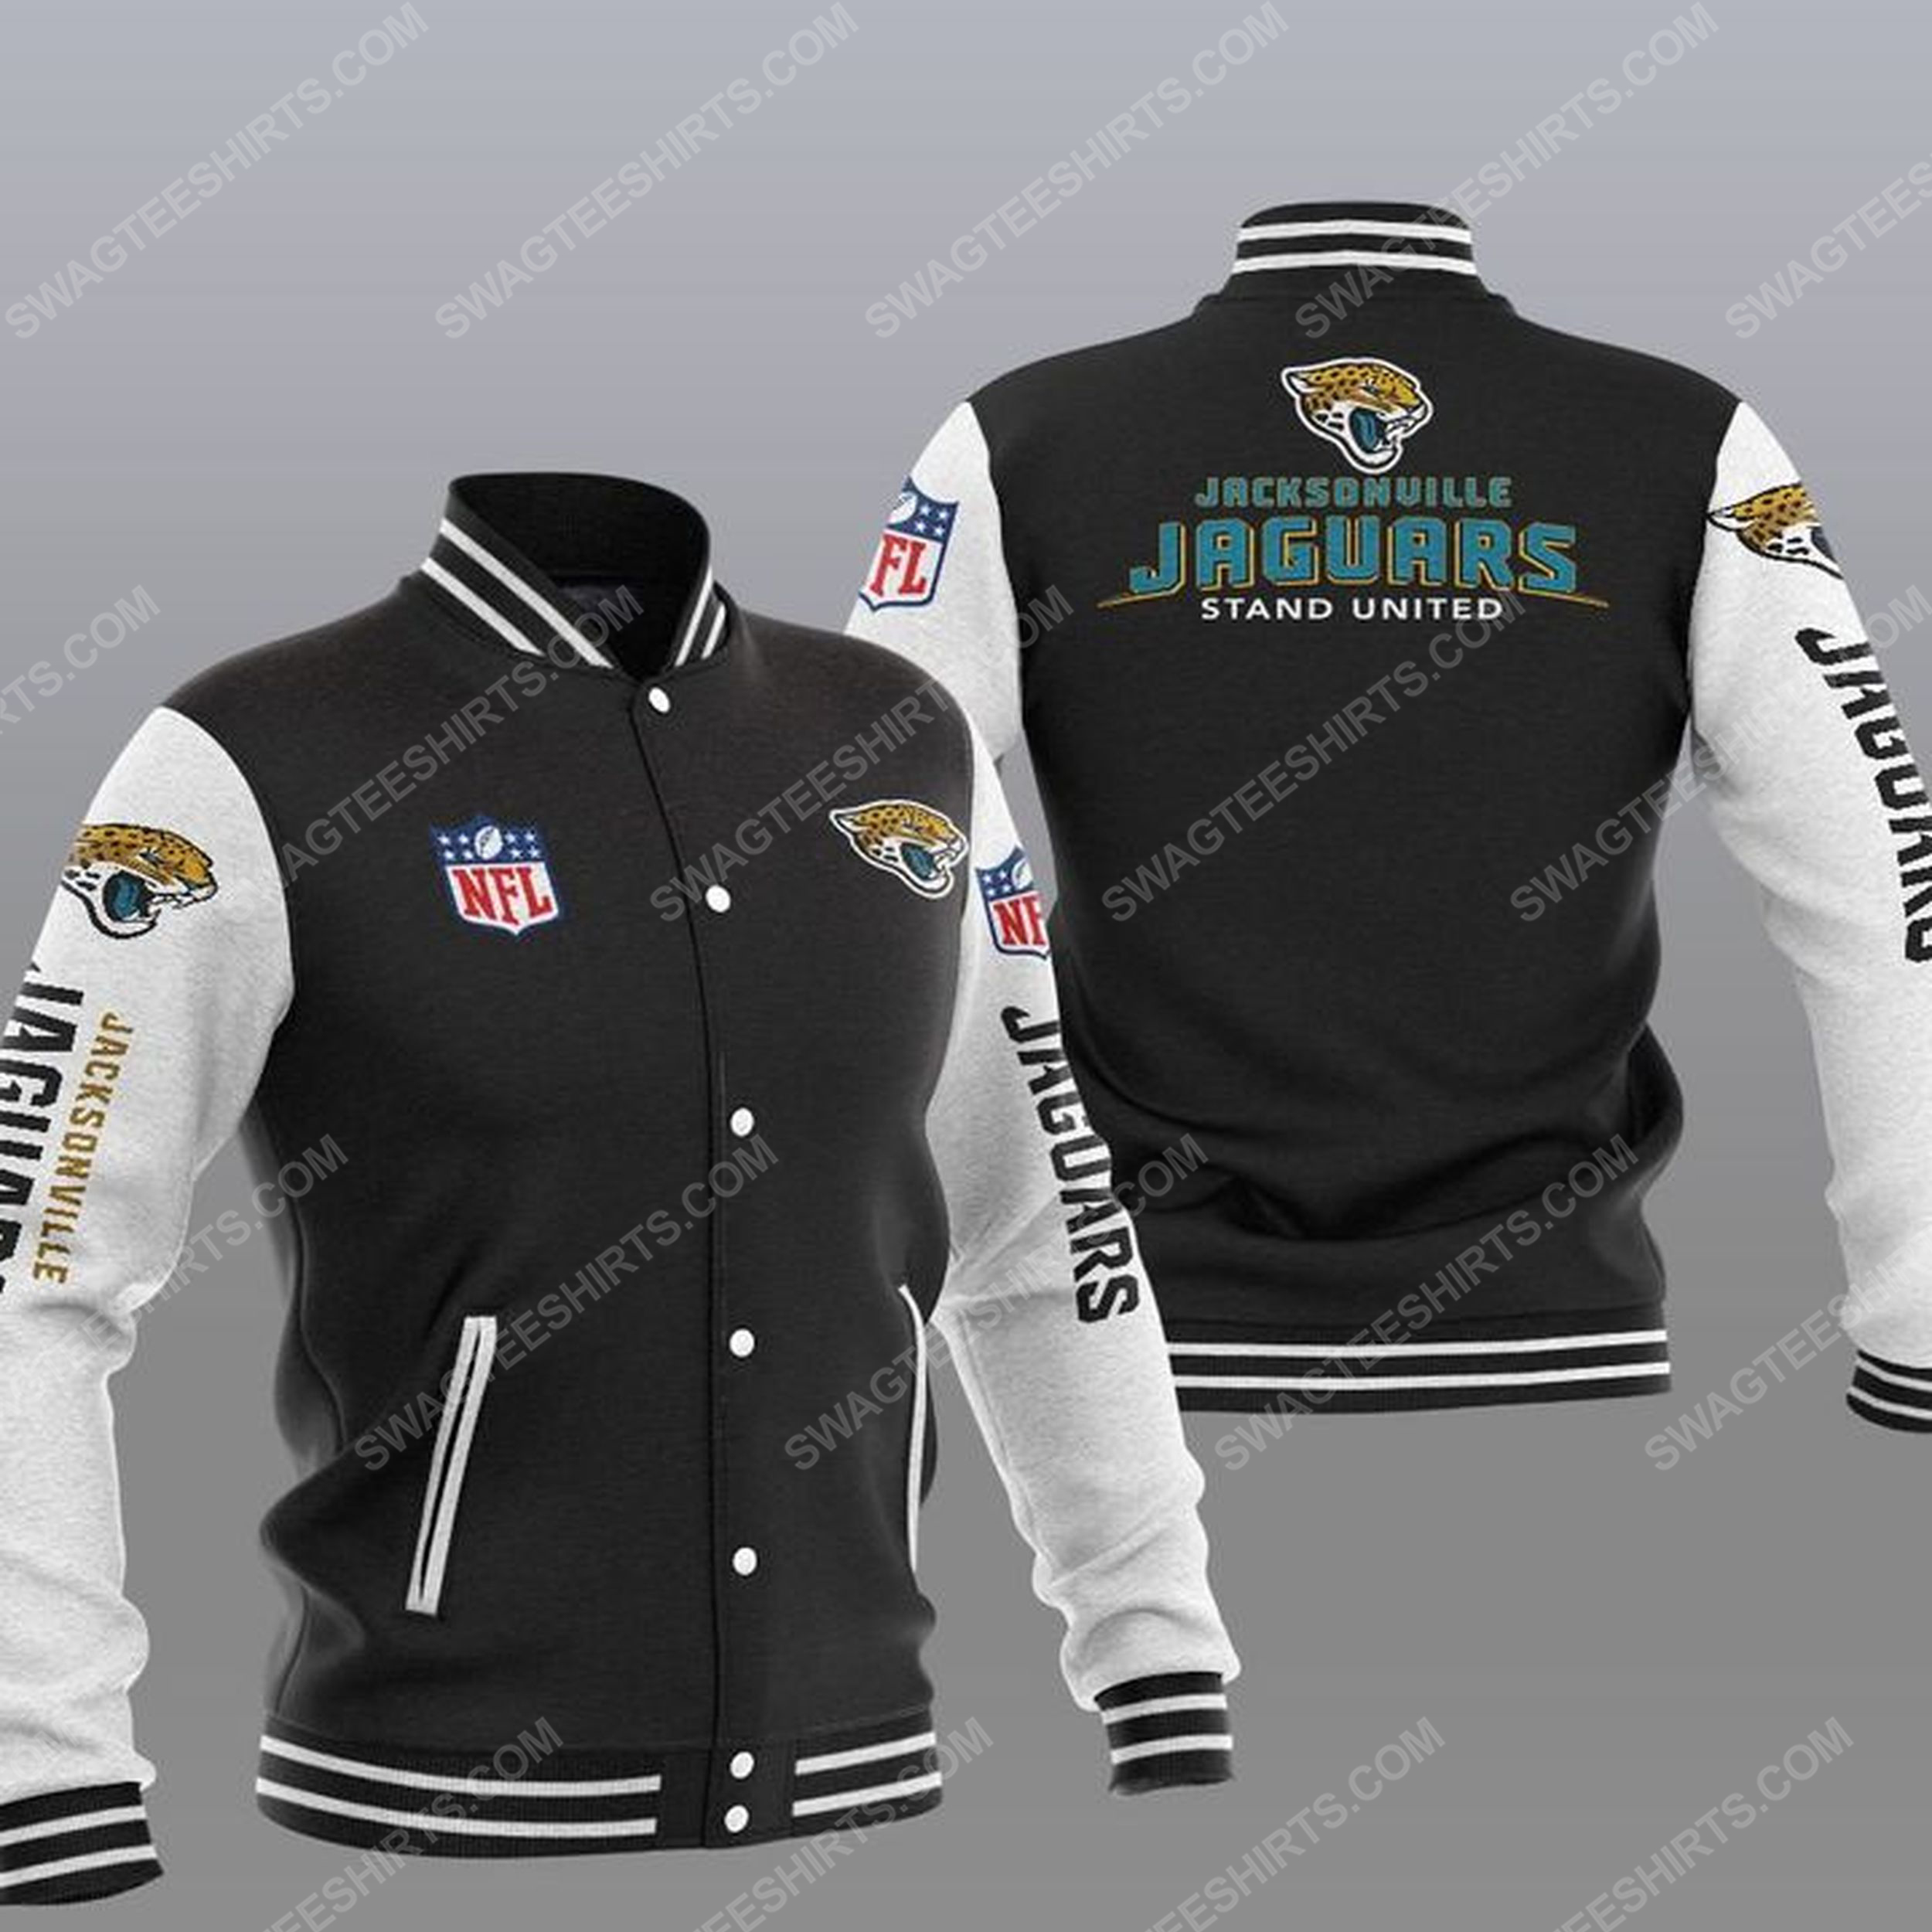 Jacksonville jaguars stand united all over print baseball jacket - black 1